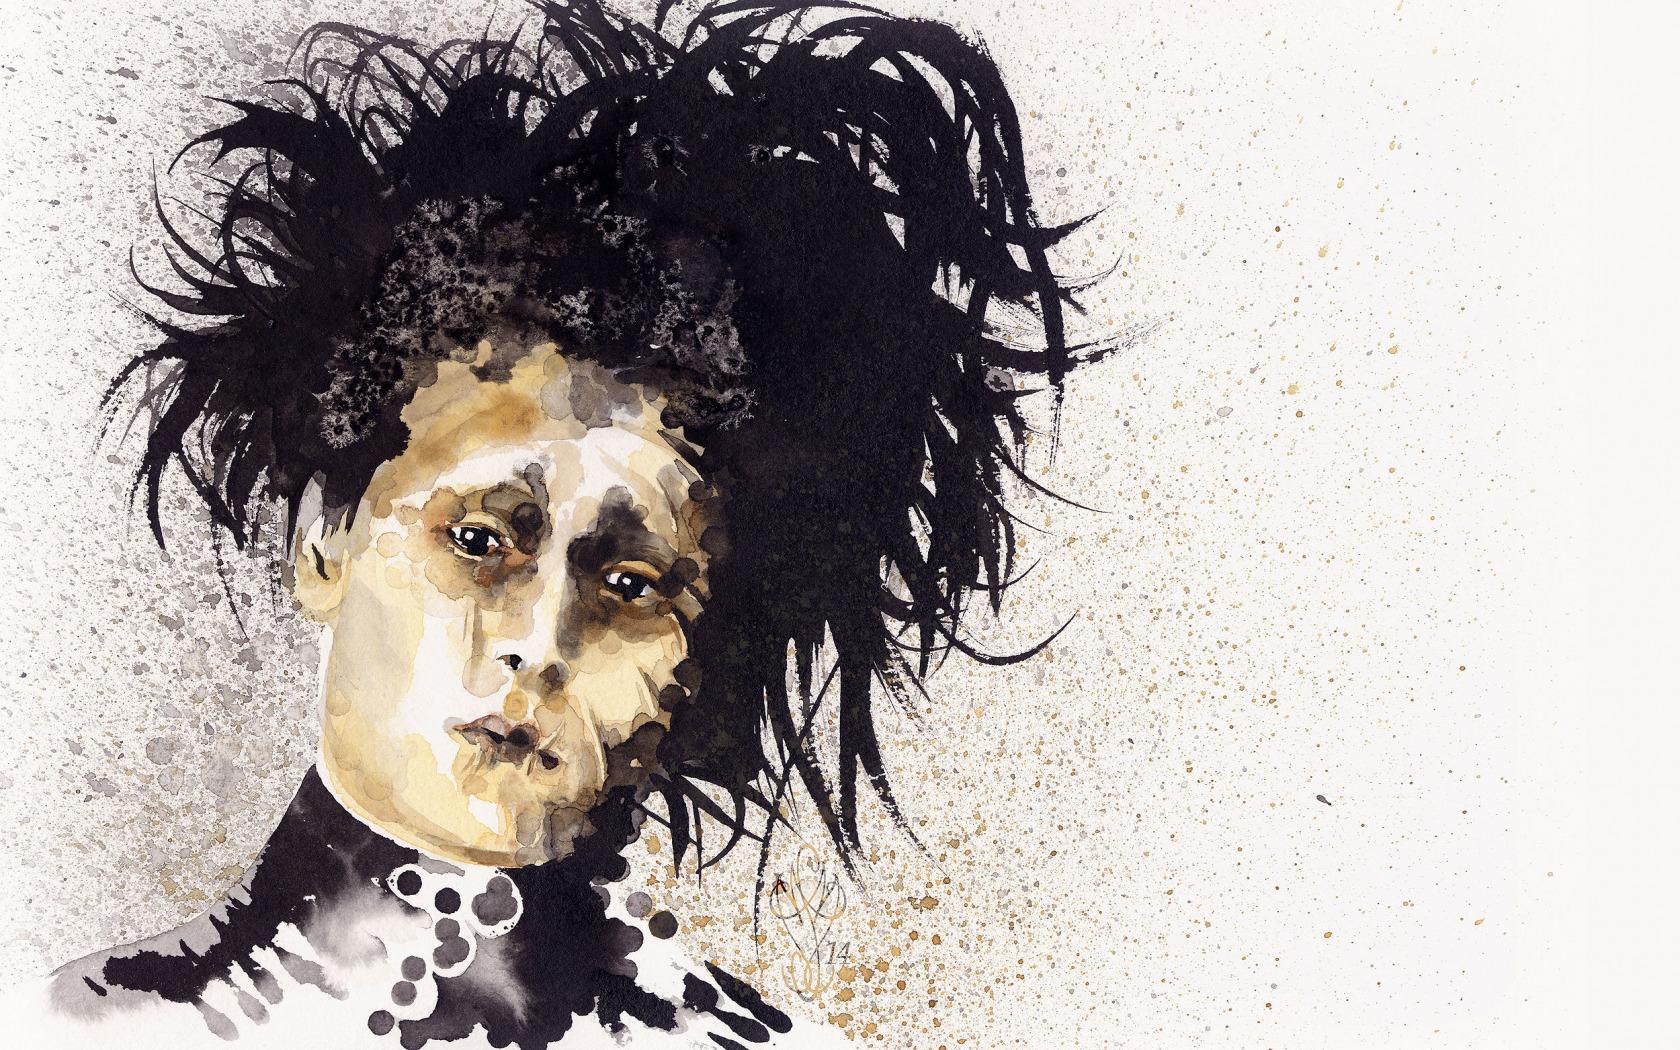 Wallpaper drawing illustration edward scissorhands head johnny